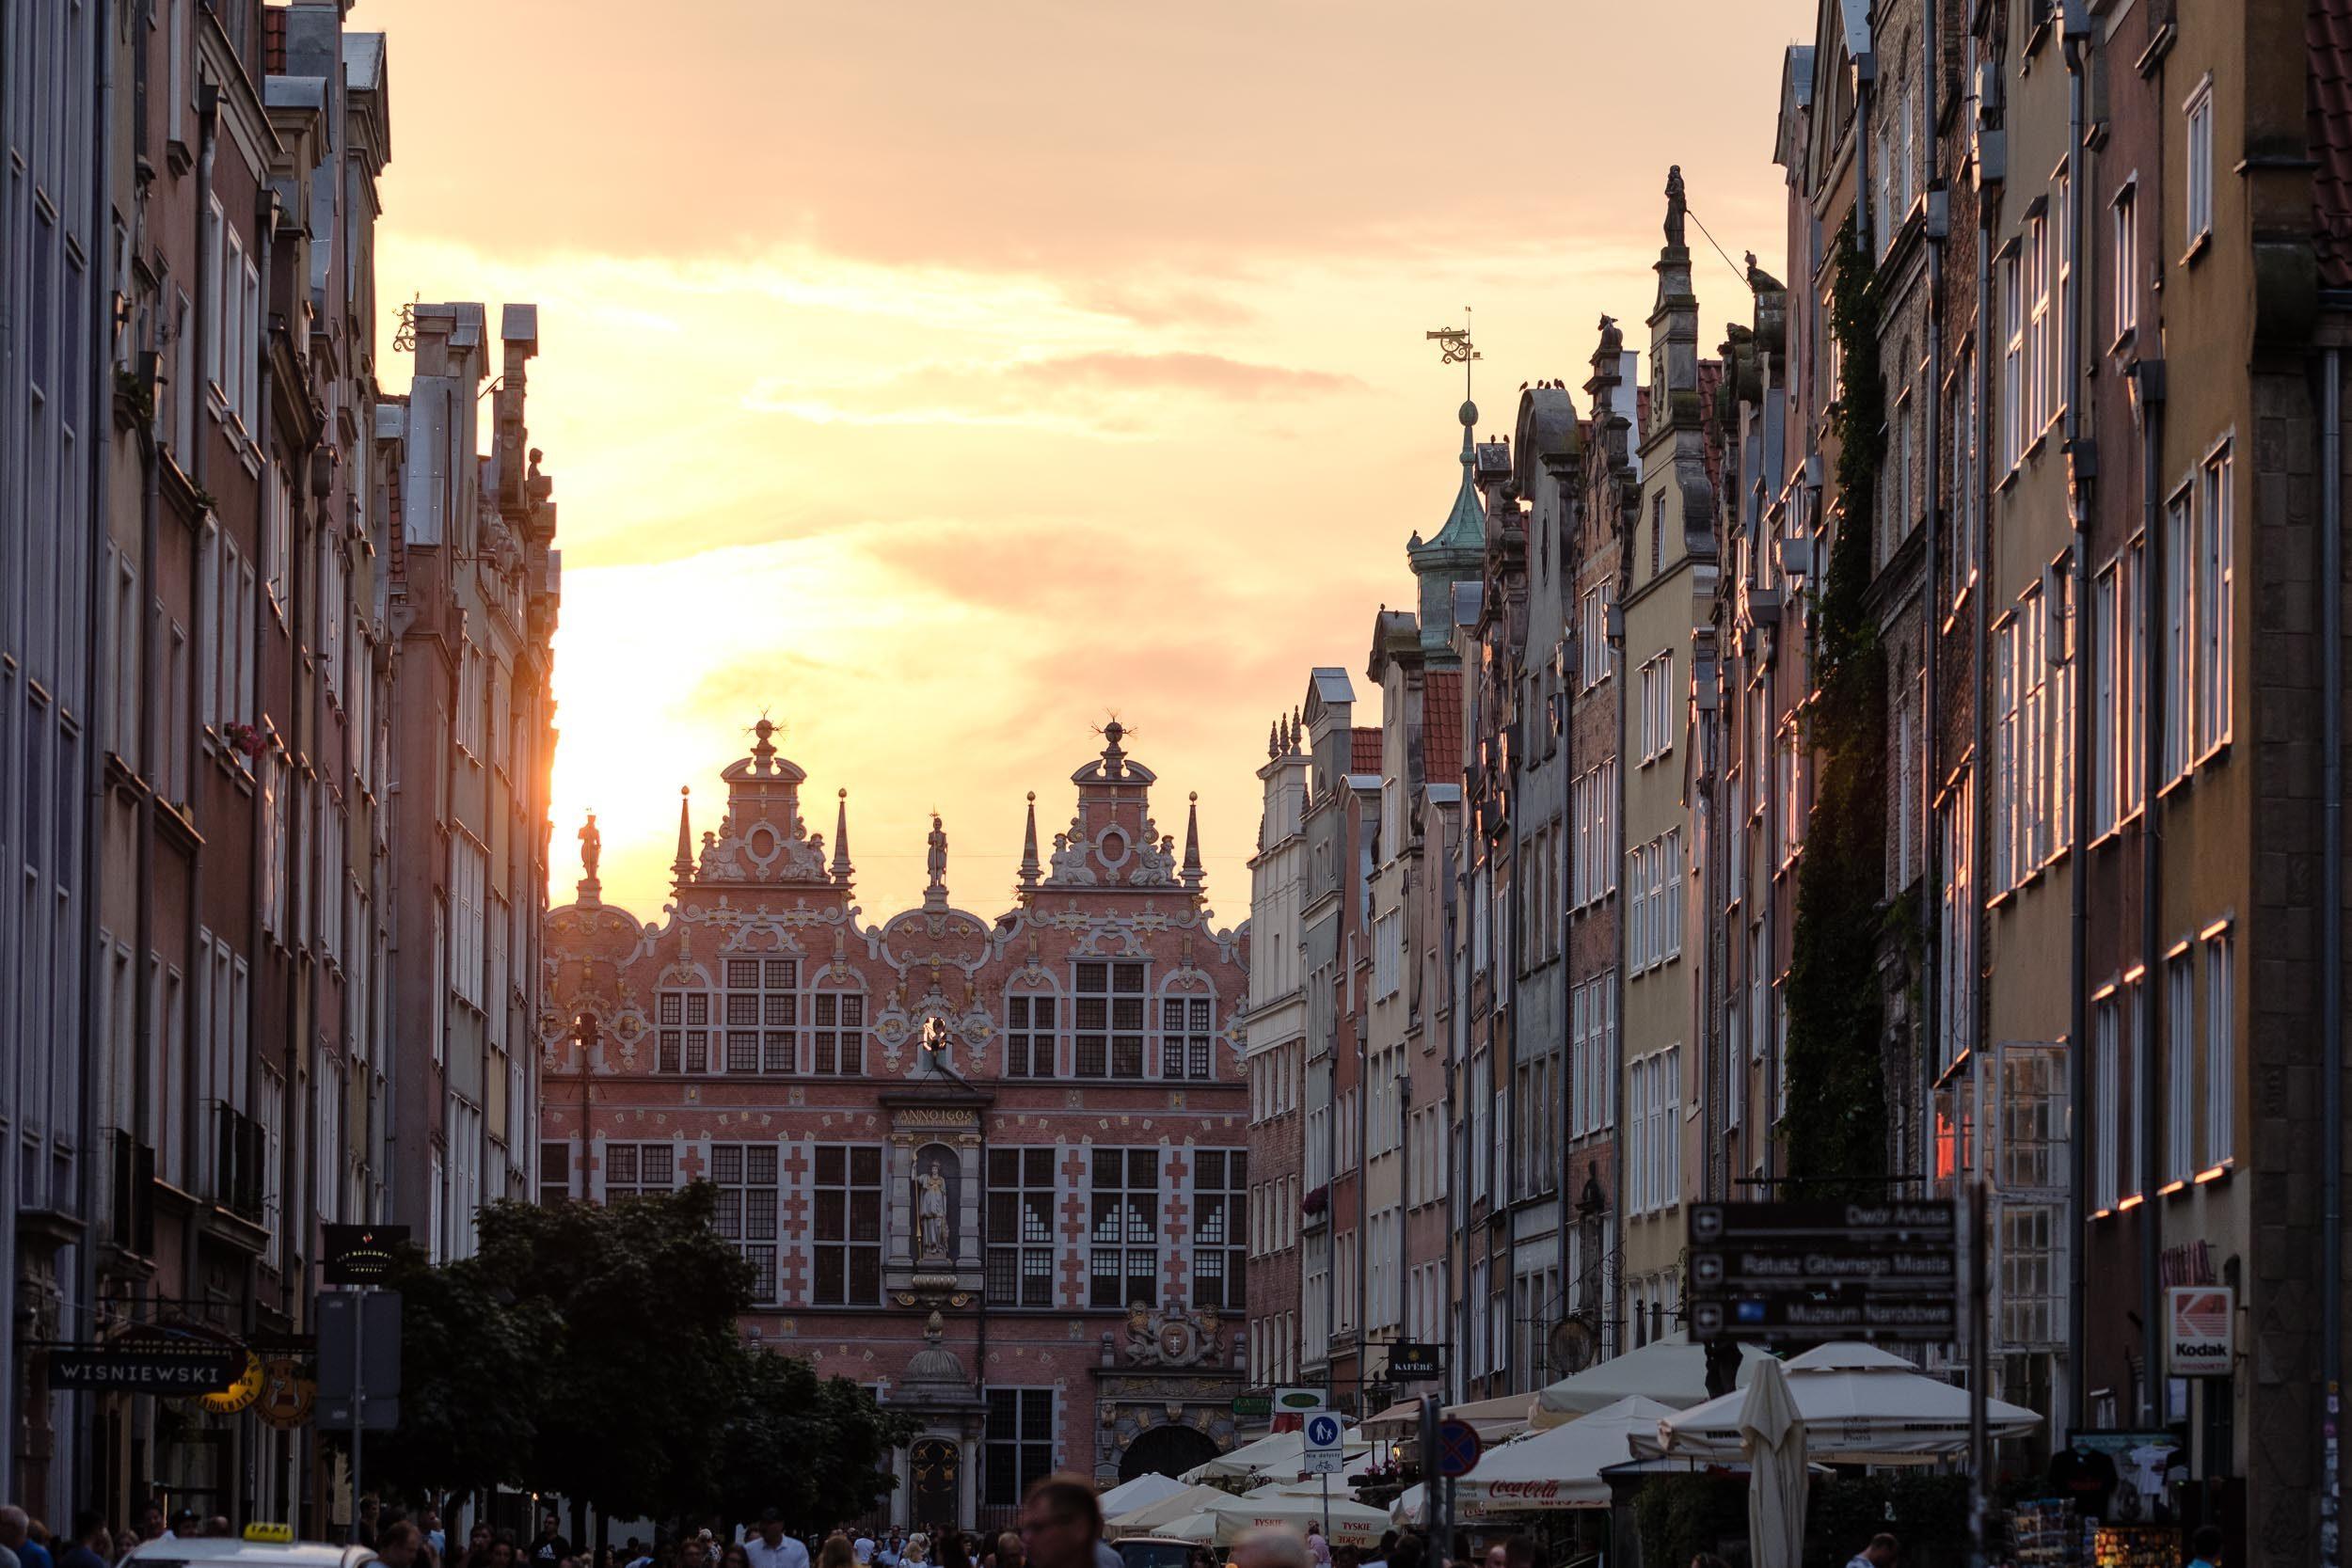 Sonnenuntergang Danzig Innenstadt